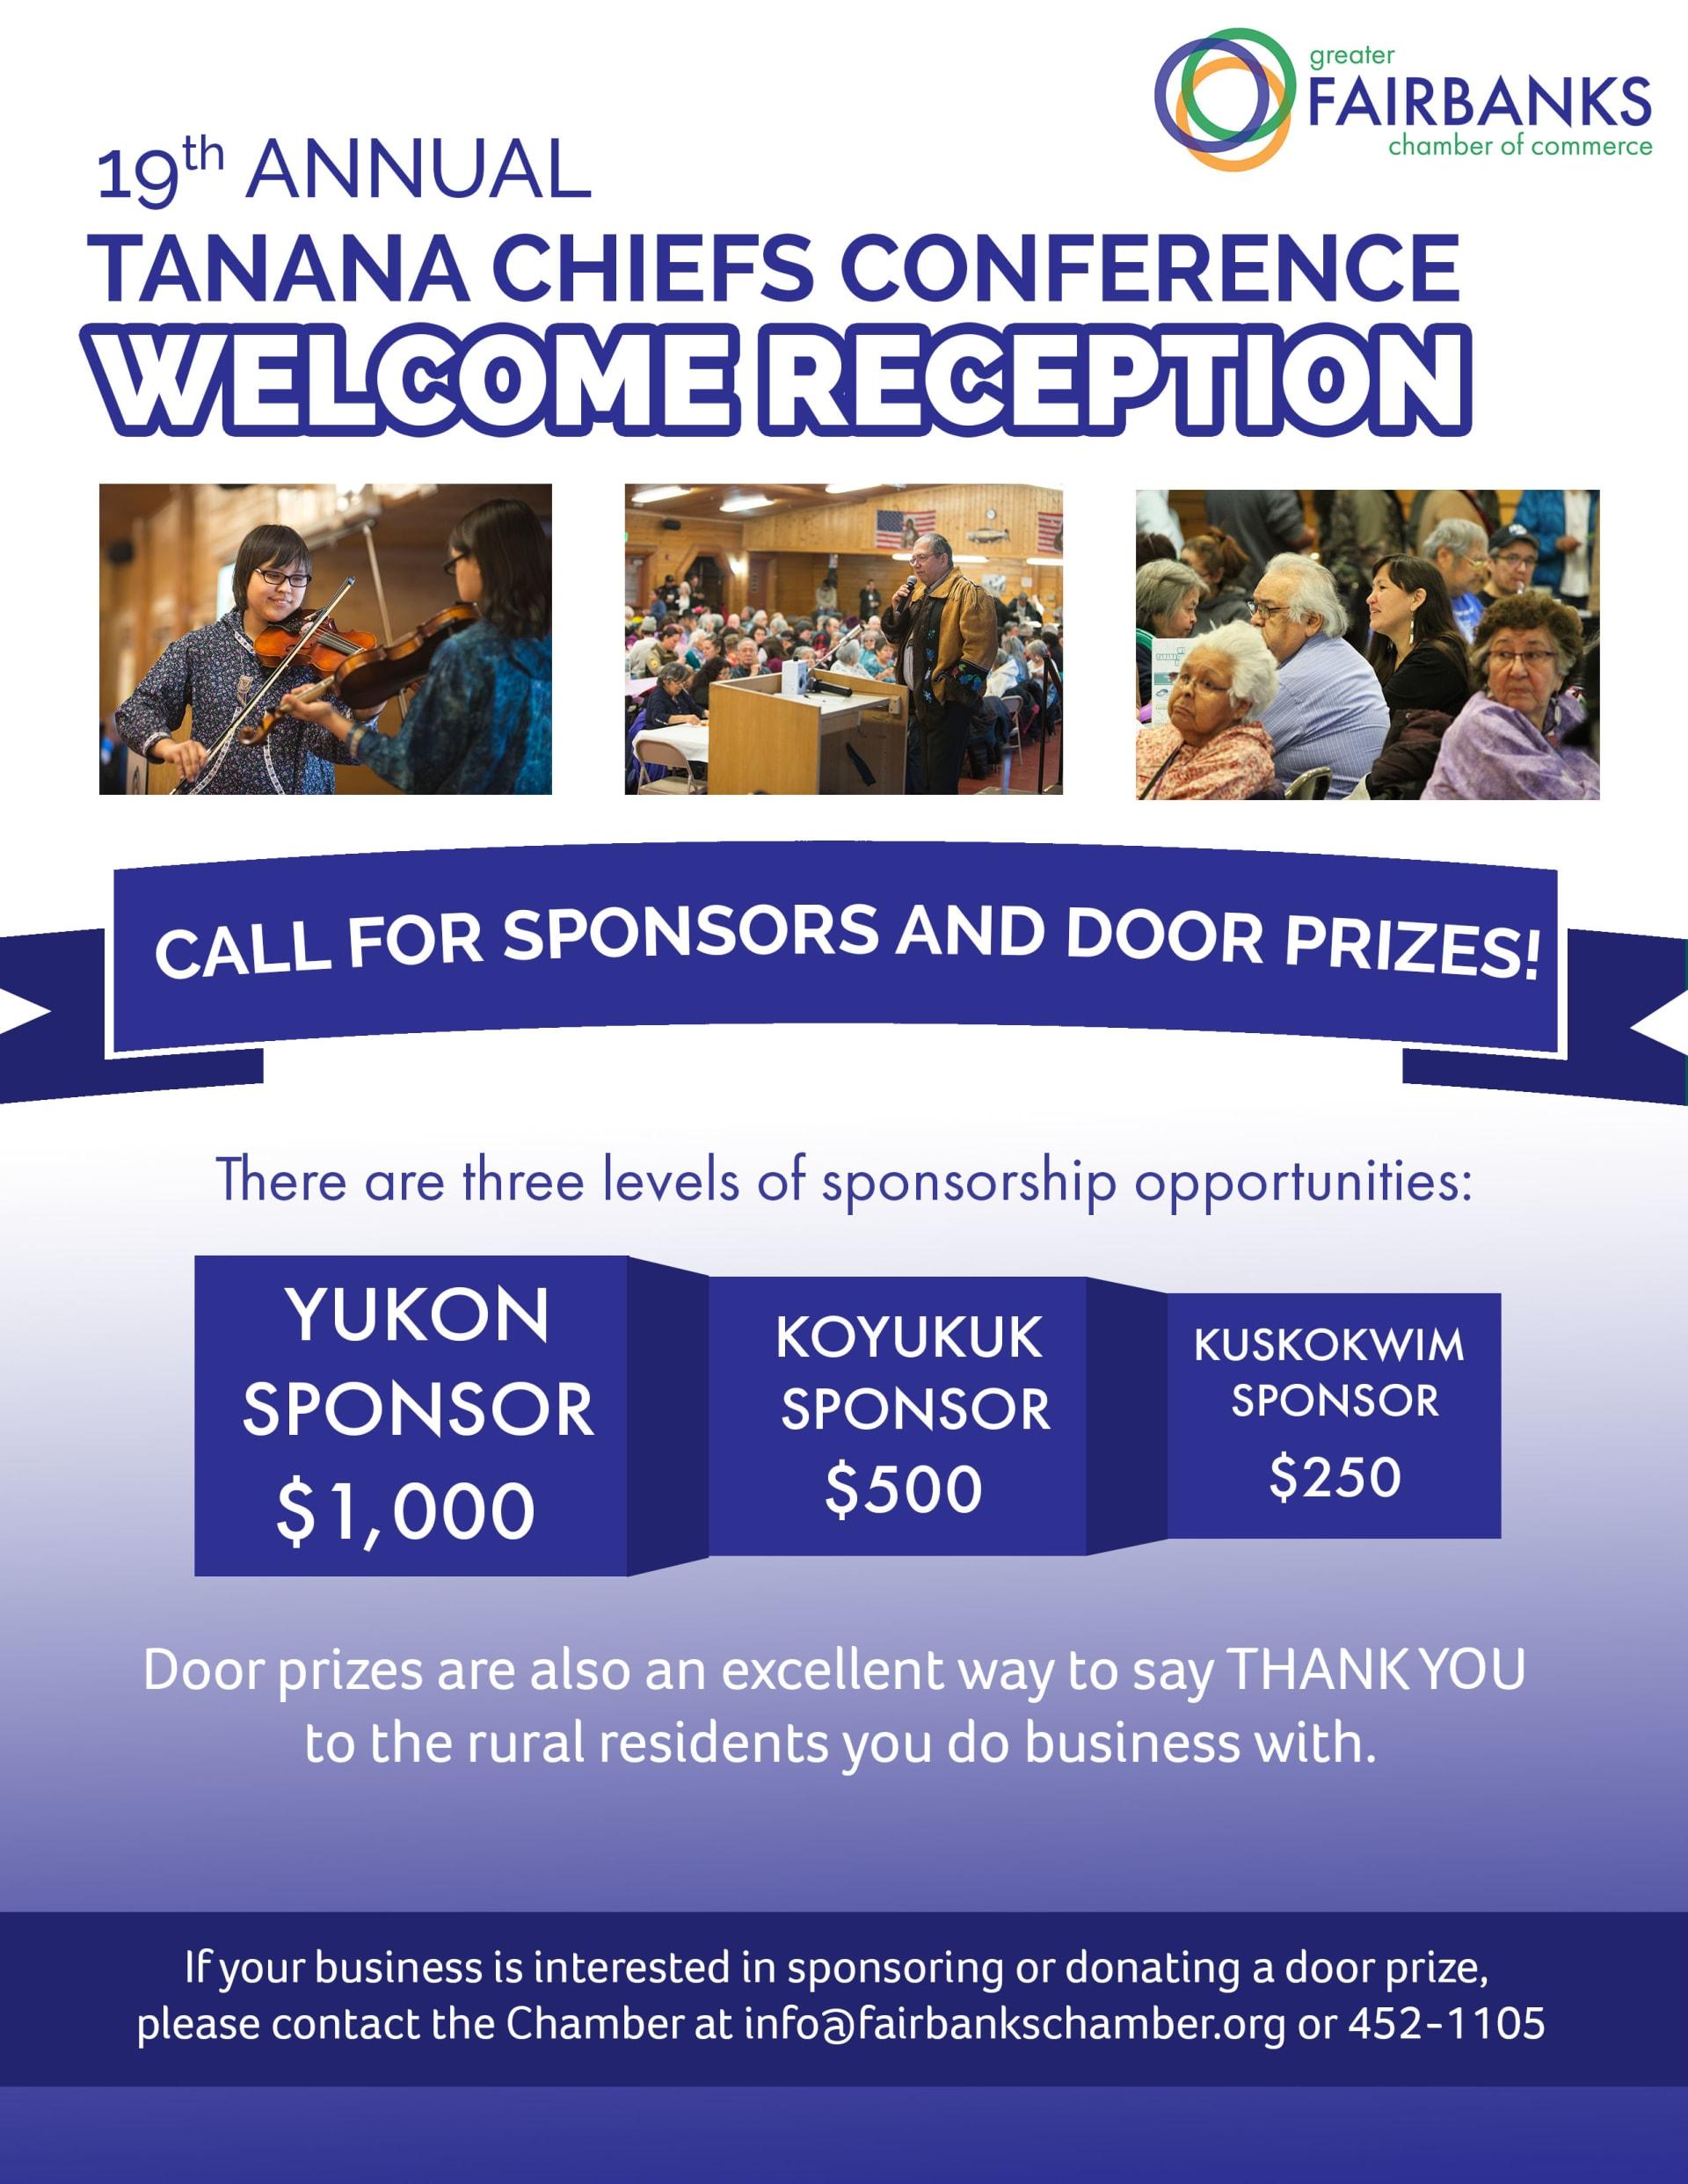 TCC-flyer--ask-for-sponsors-w1920.jpg